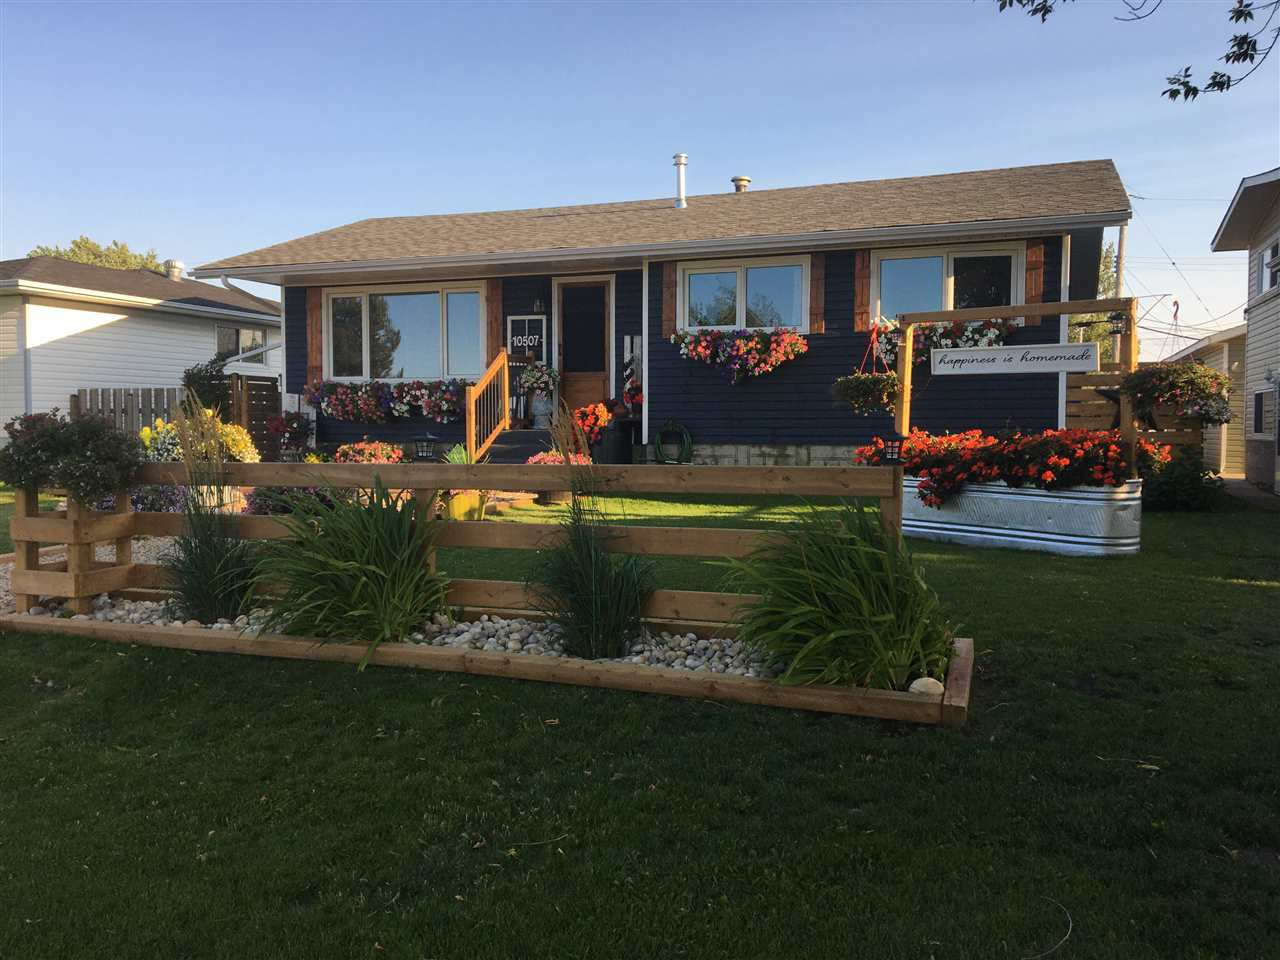 Main Photo: 10507 105 Street: Westlock House for sale : MLS®# E4219235